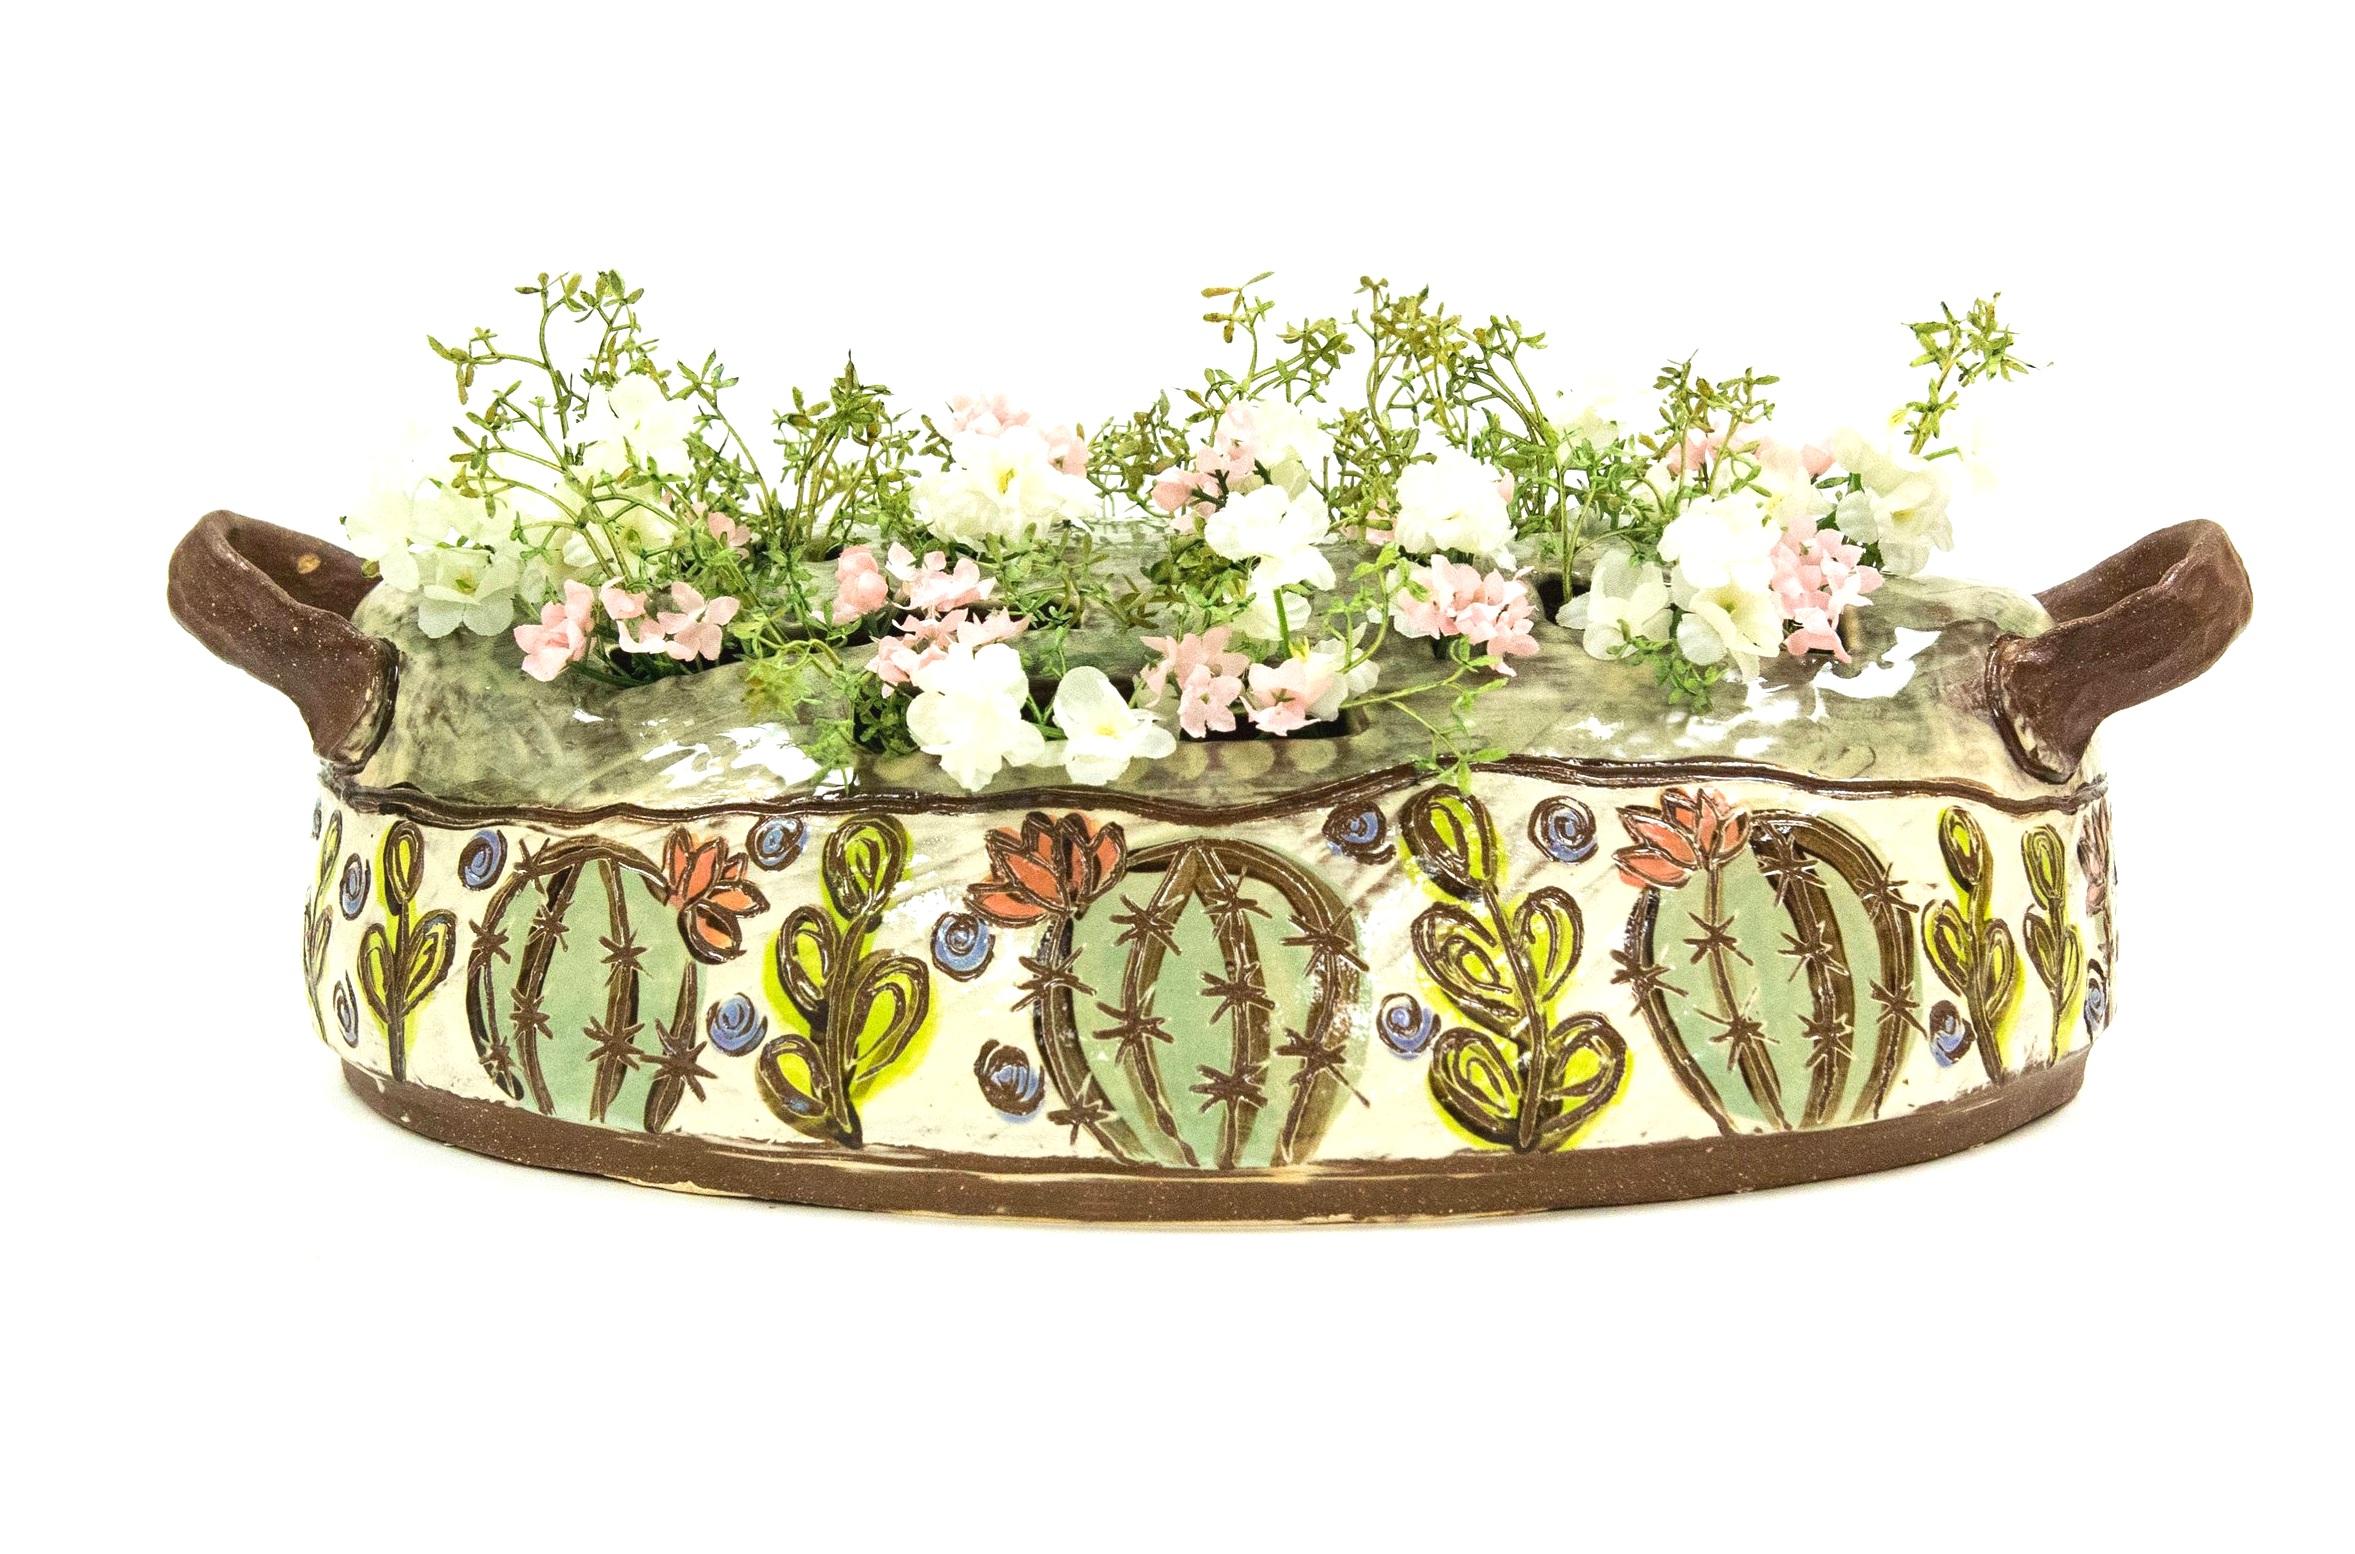 Flower Basket, Terracotta, Δ3 Oxidation, 2018